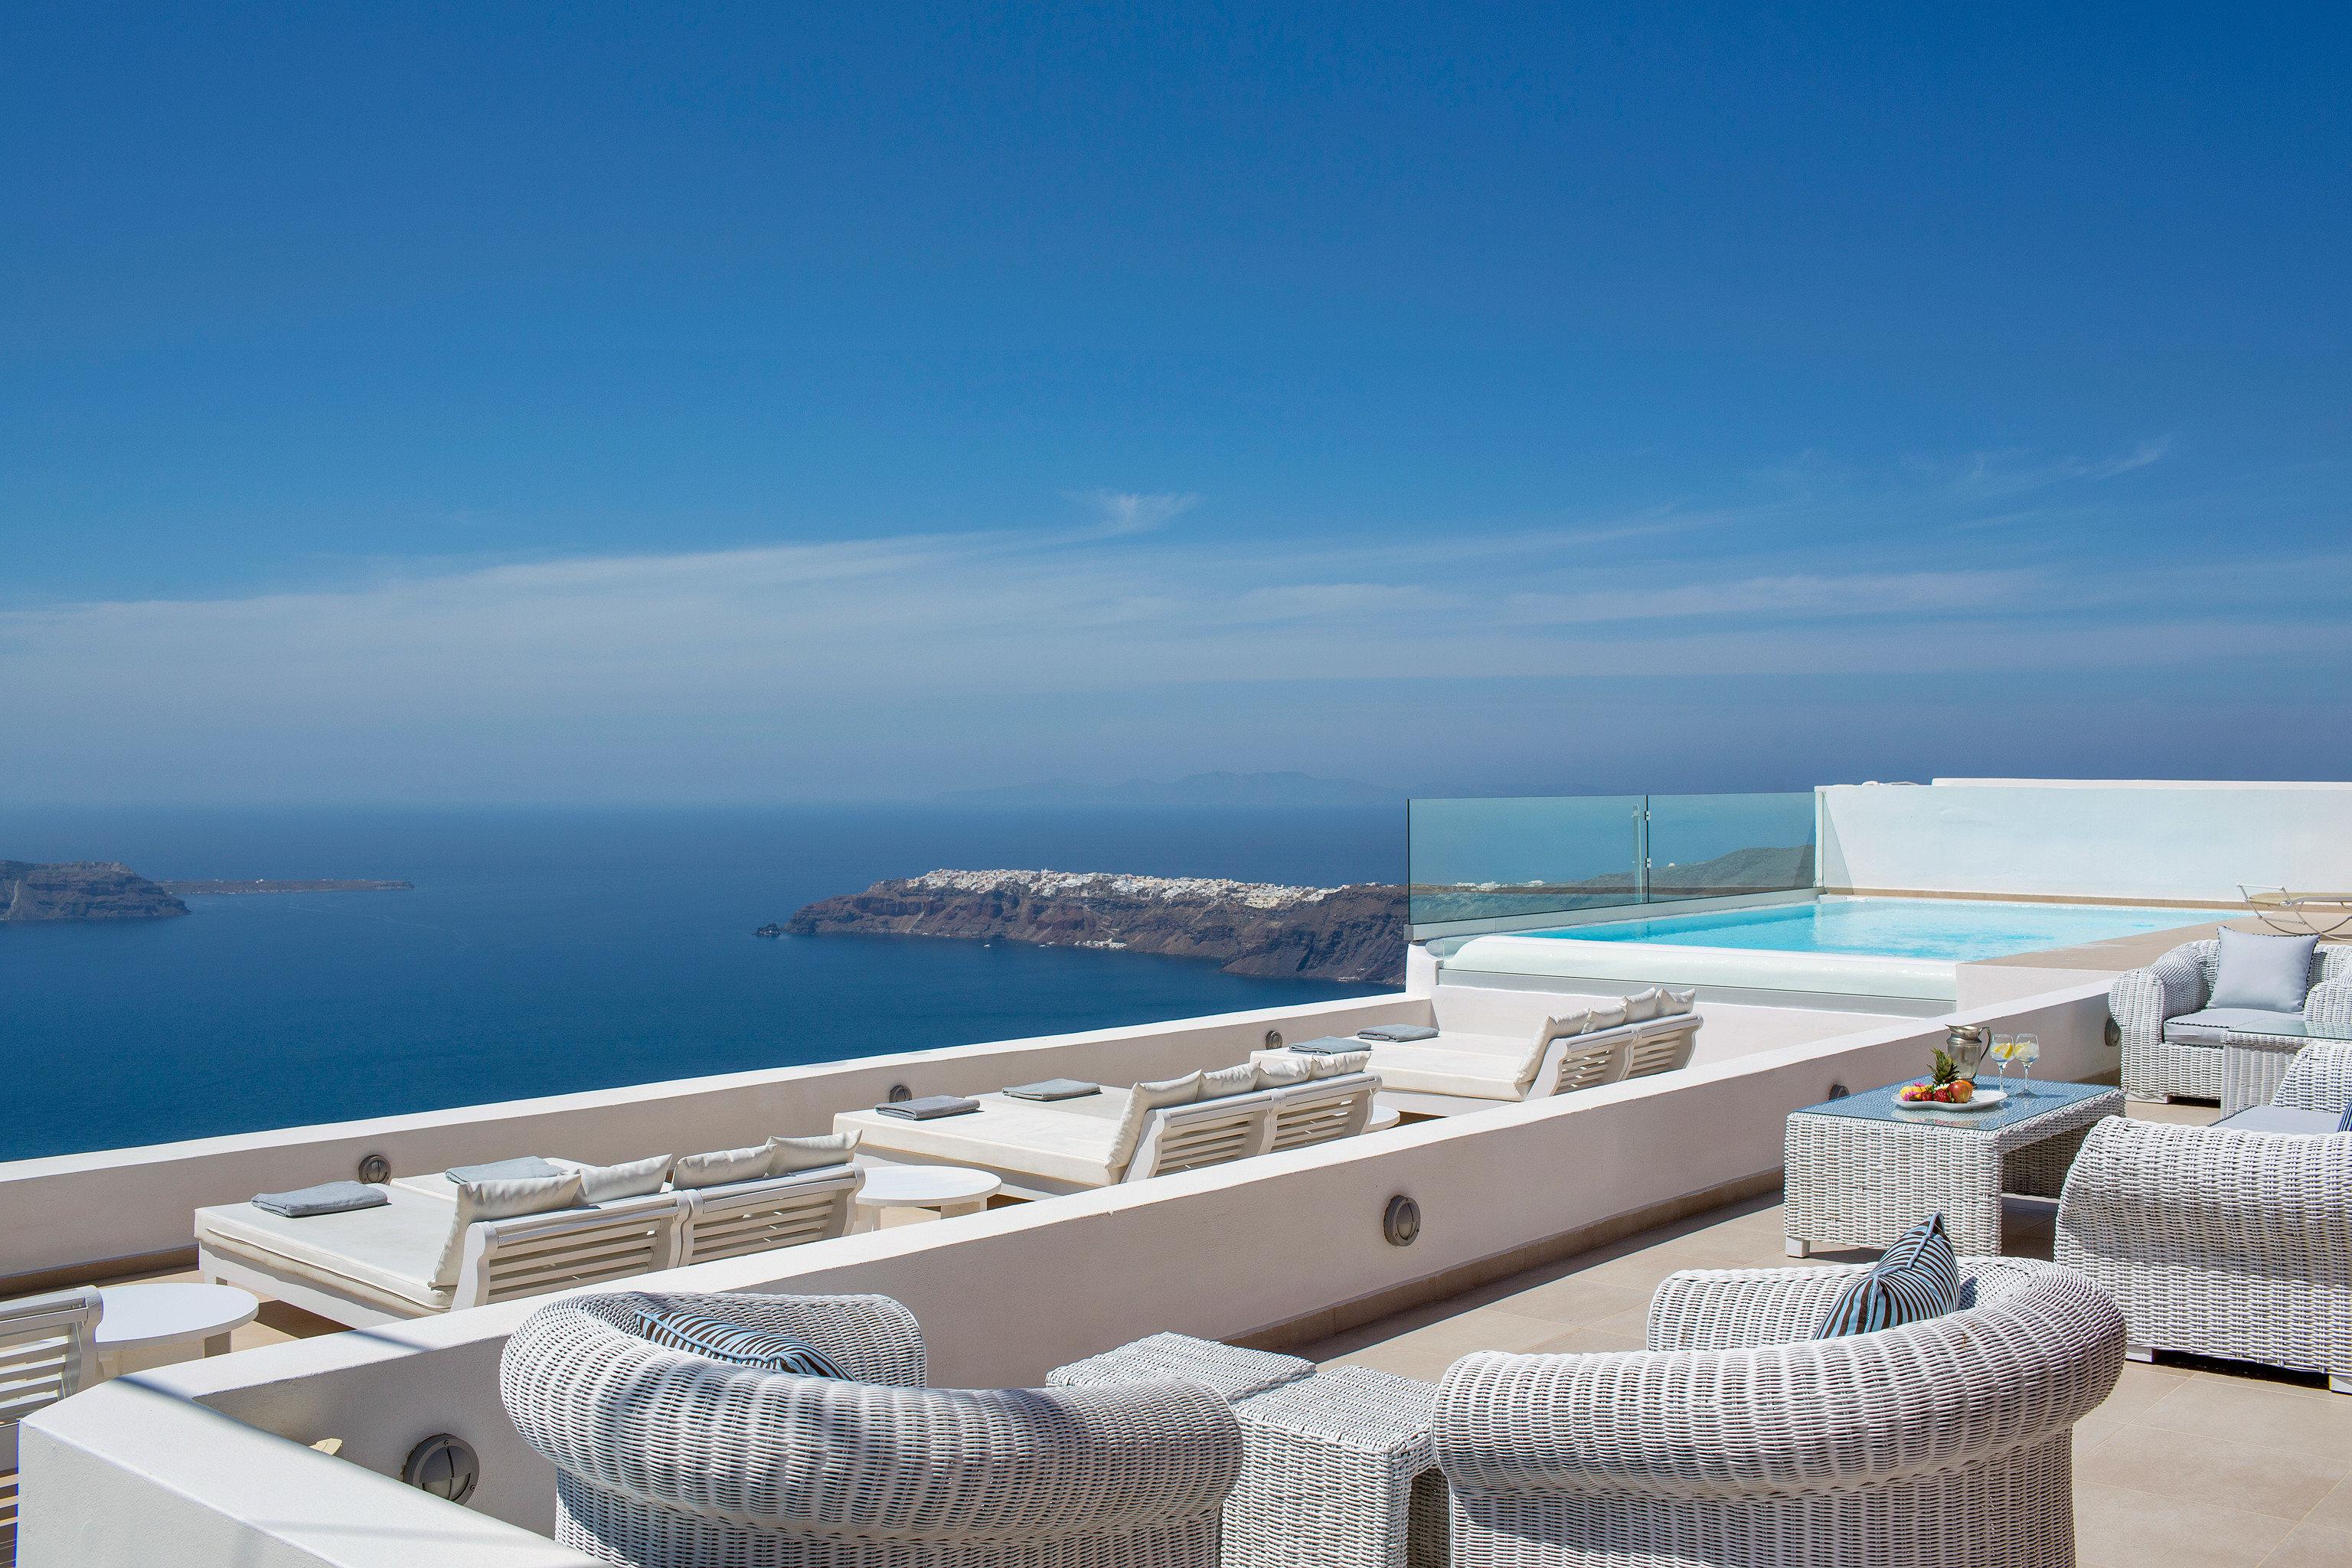 Balcony Deck Elegant Honeymoon Pool Romance Romantic Scenic views sky water property Sea passenger ship Ocean swimming pool yacht Villa Resort Coast caribbean vehicle overlooking shore day